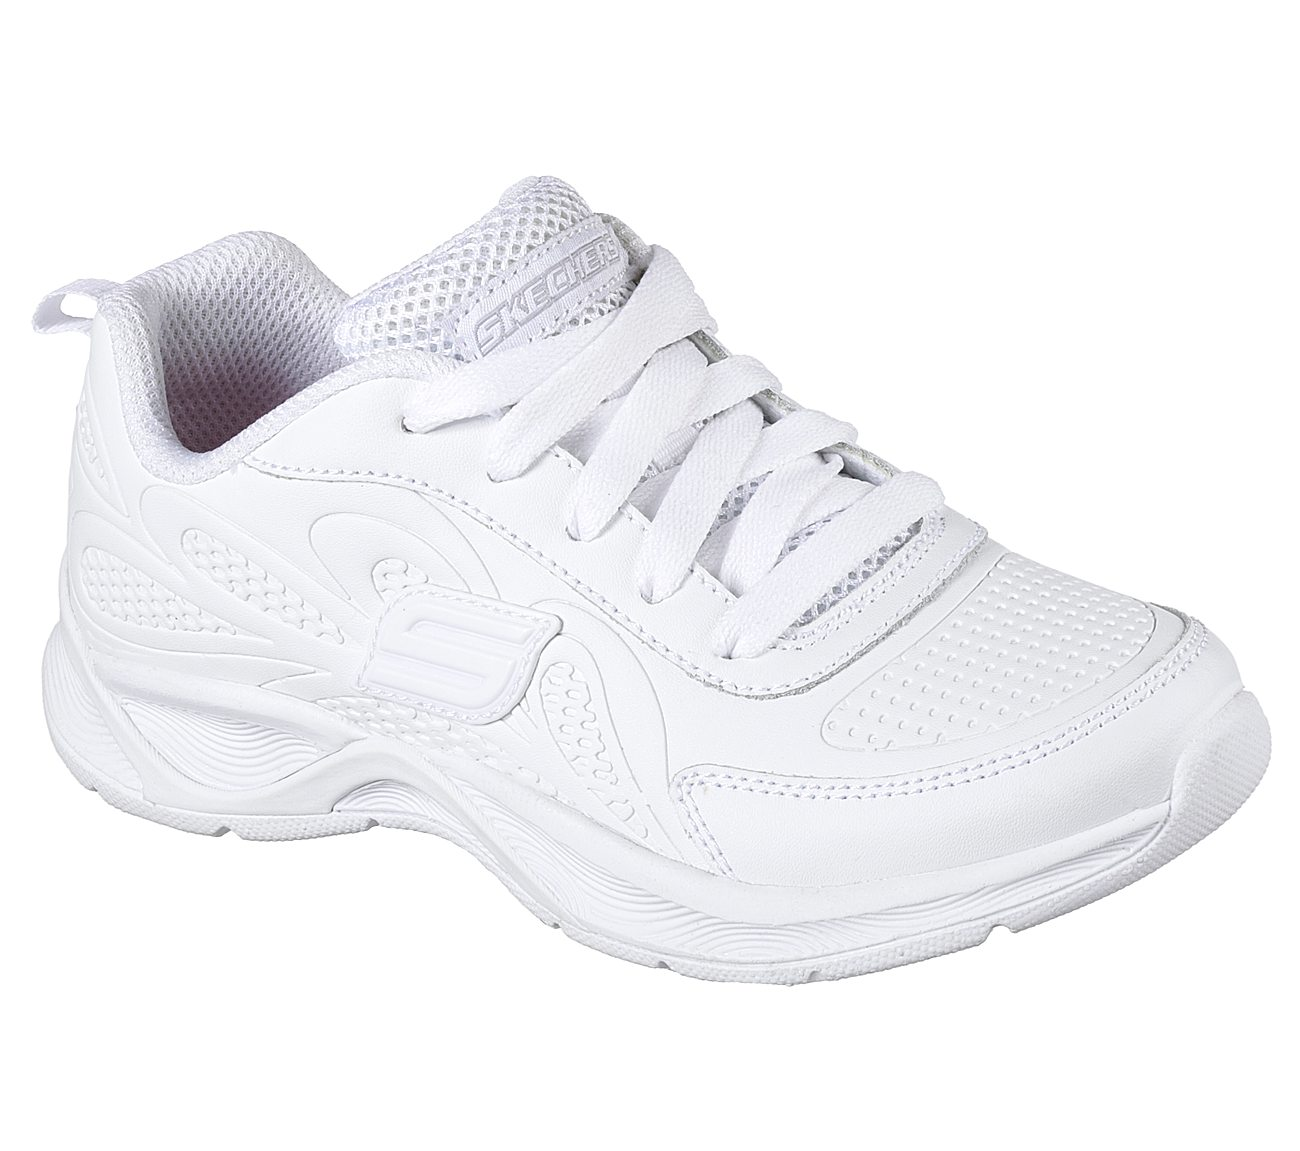 plain hvit skechers purchase 2da94 21899